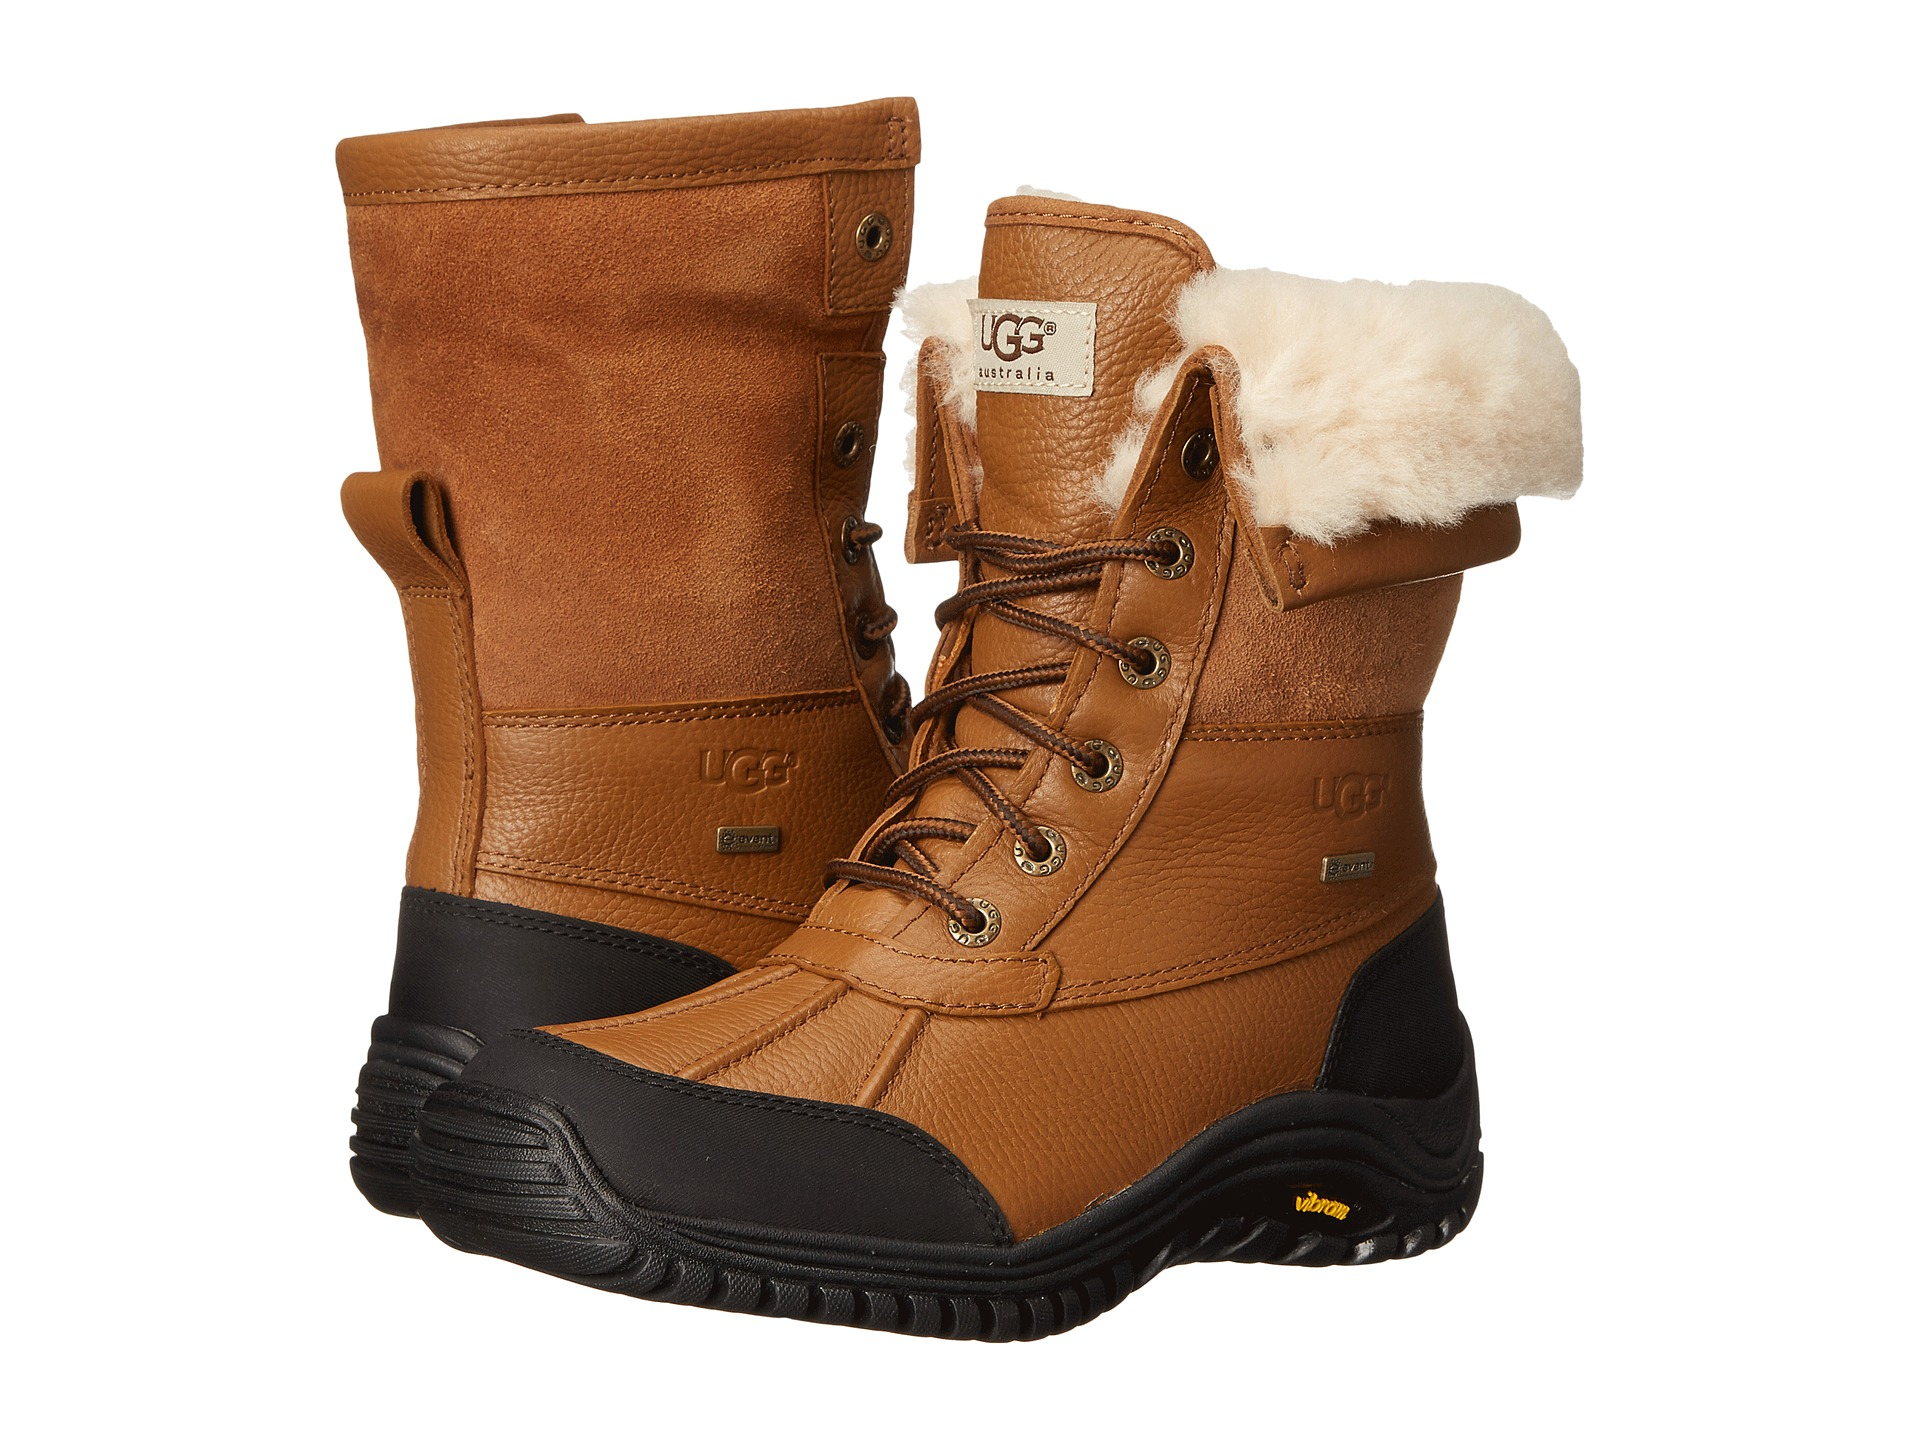 ugg adirondack boot ii at zappos